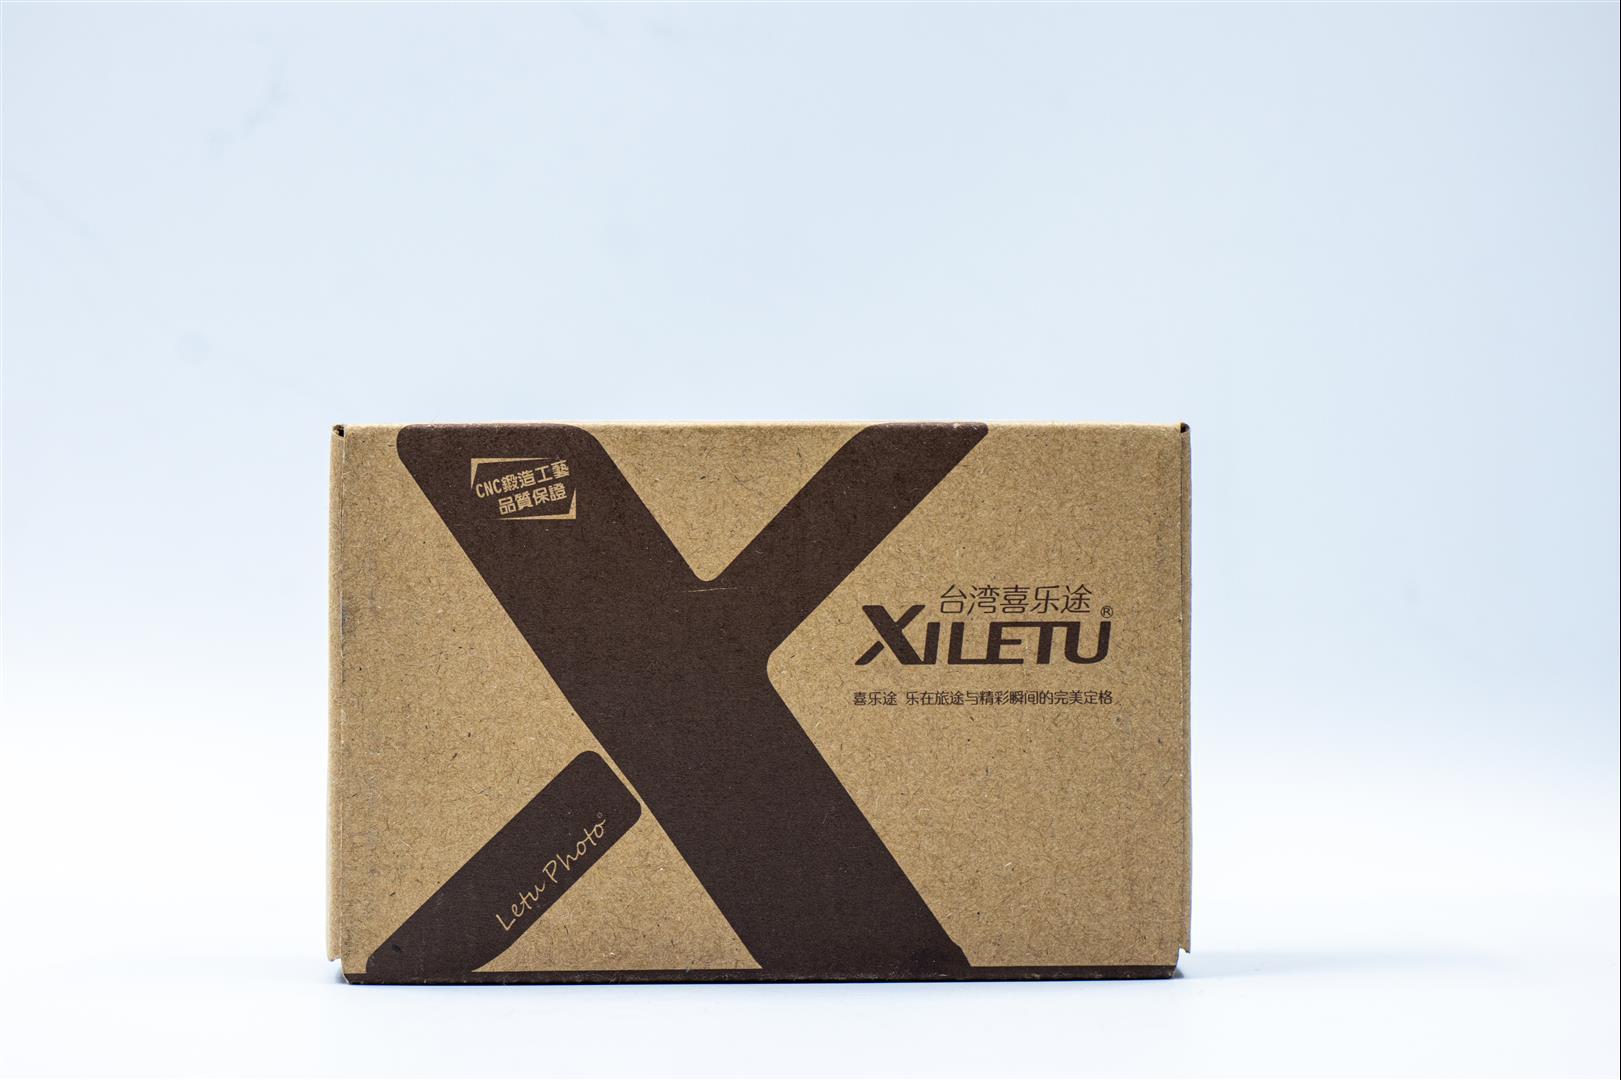 XILETU XJ-8